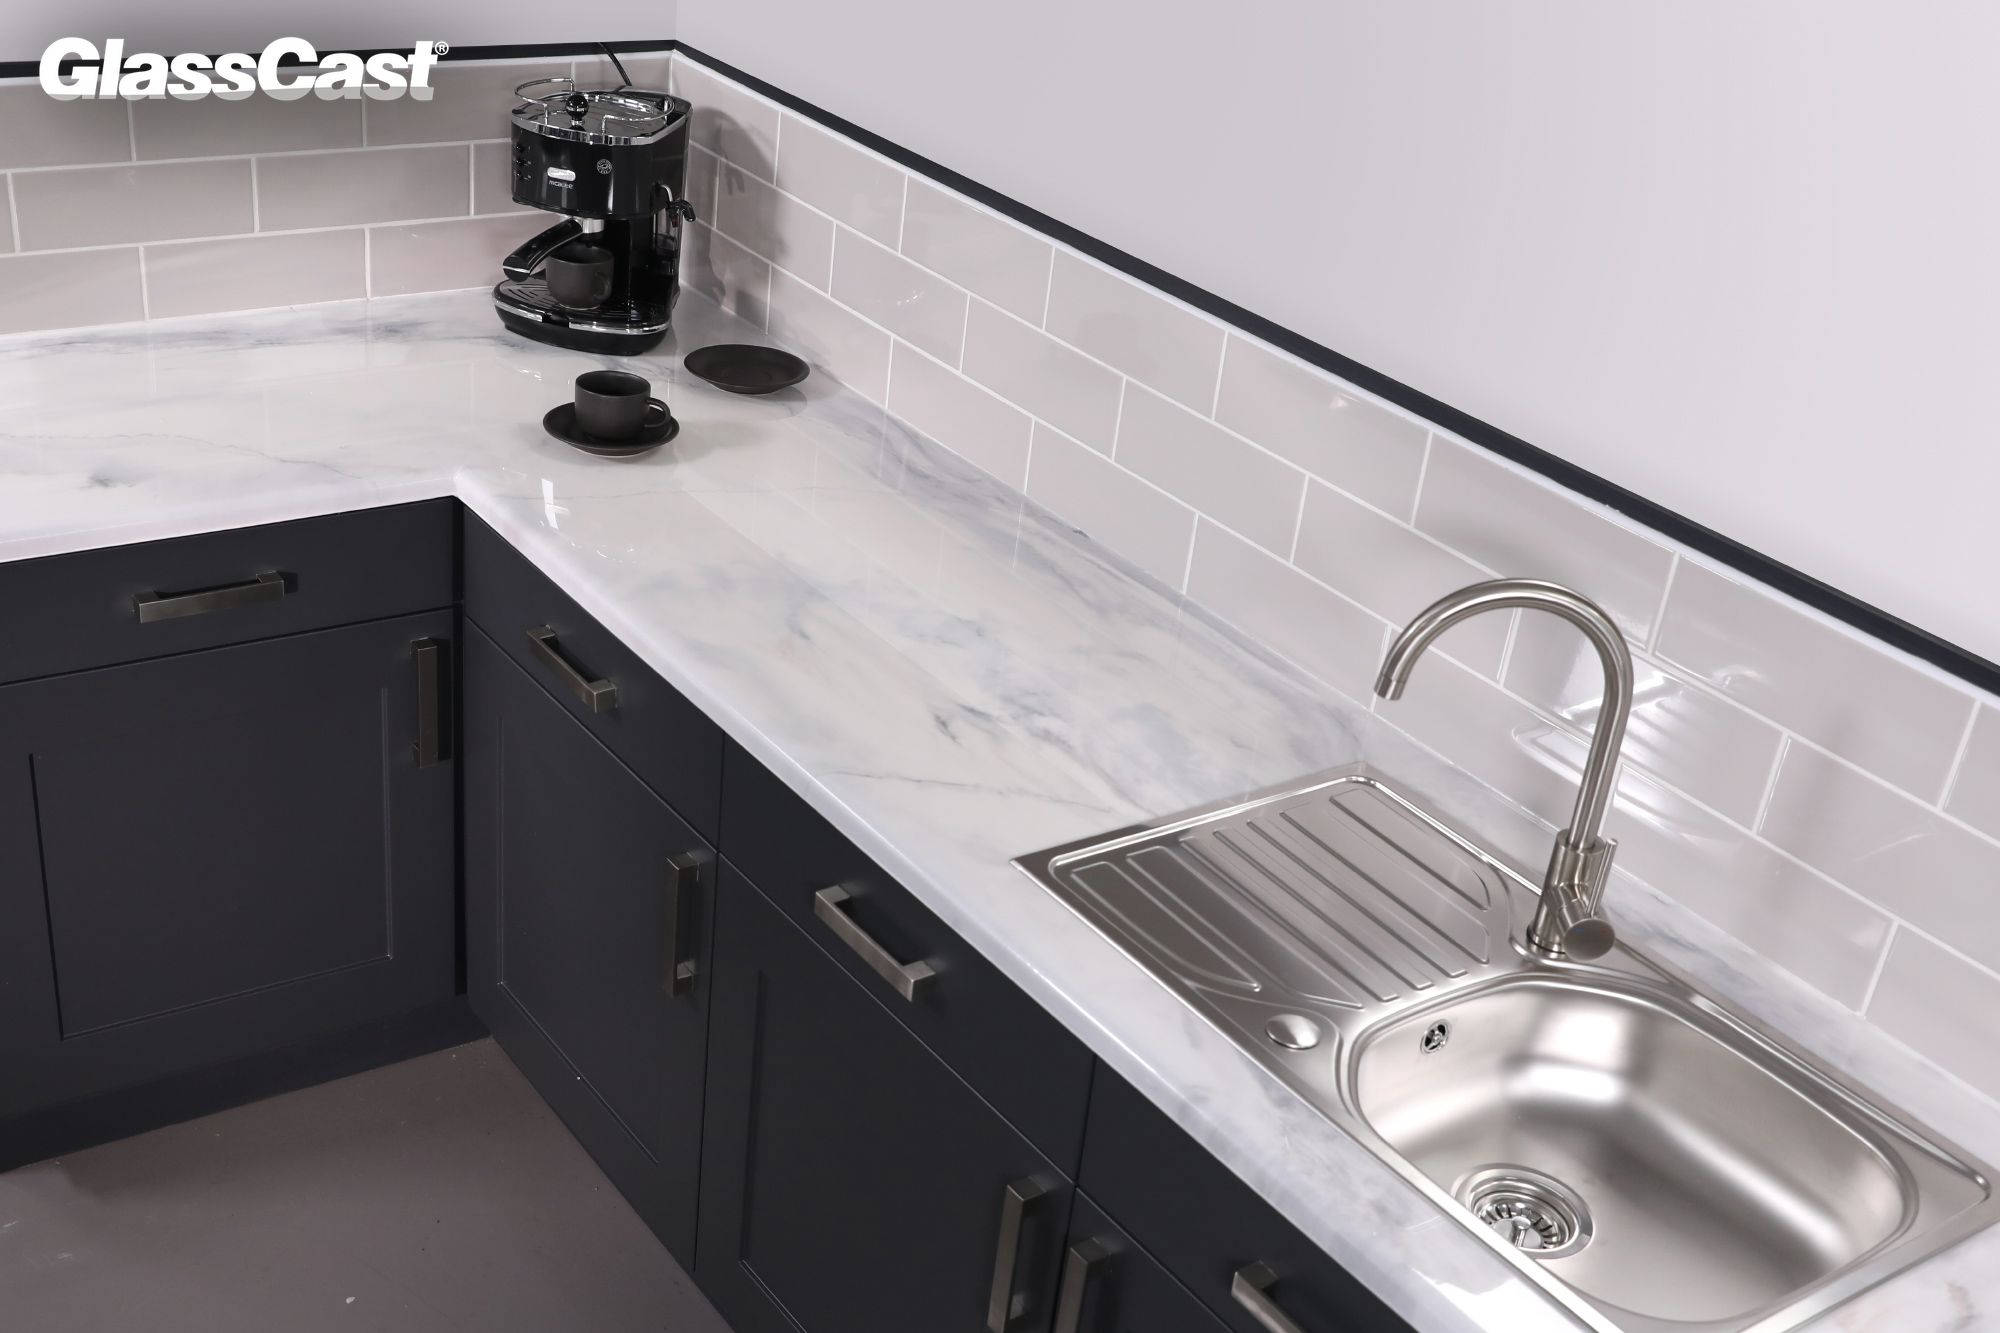 Carrara White Marble Epoxy Resin Countertop Kit Glasscast